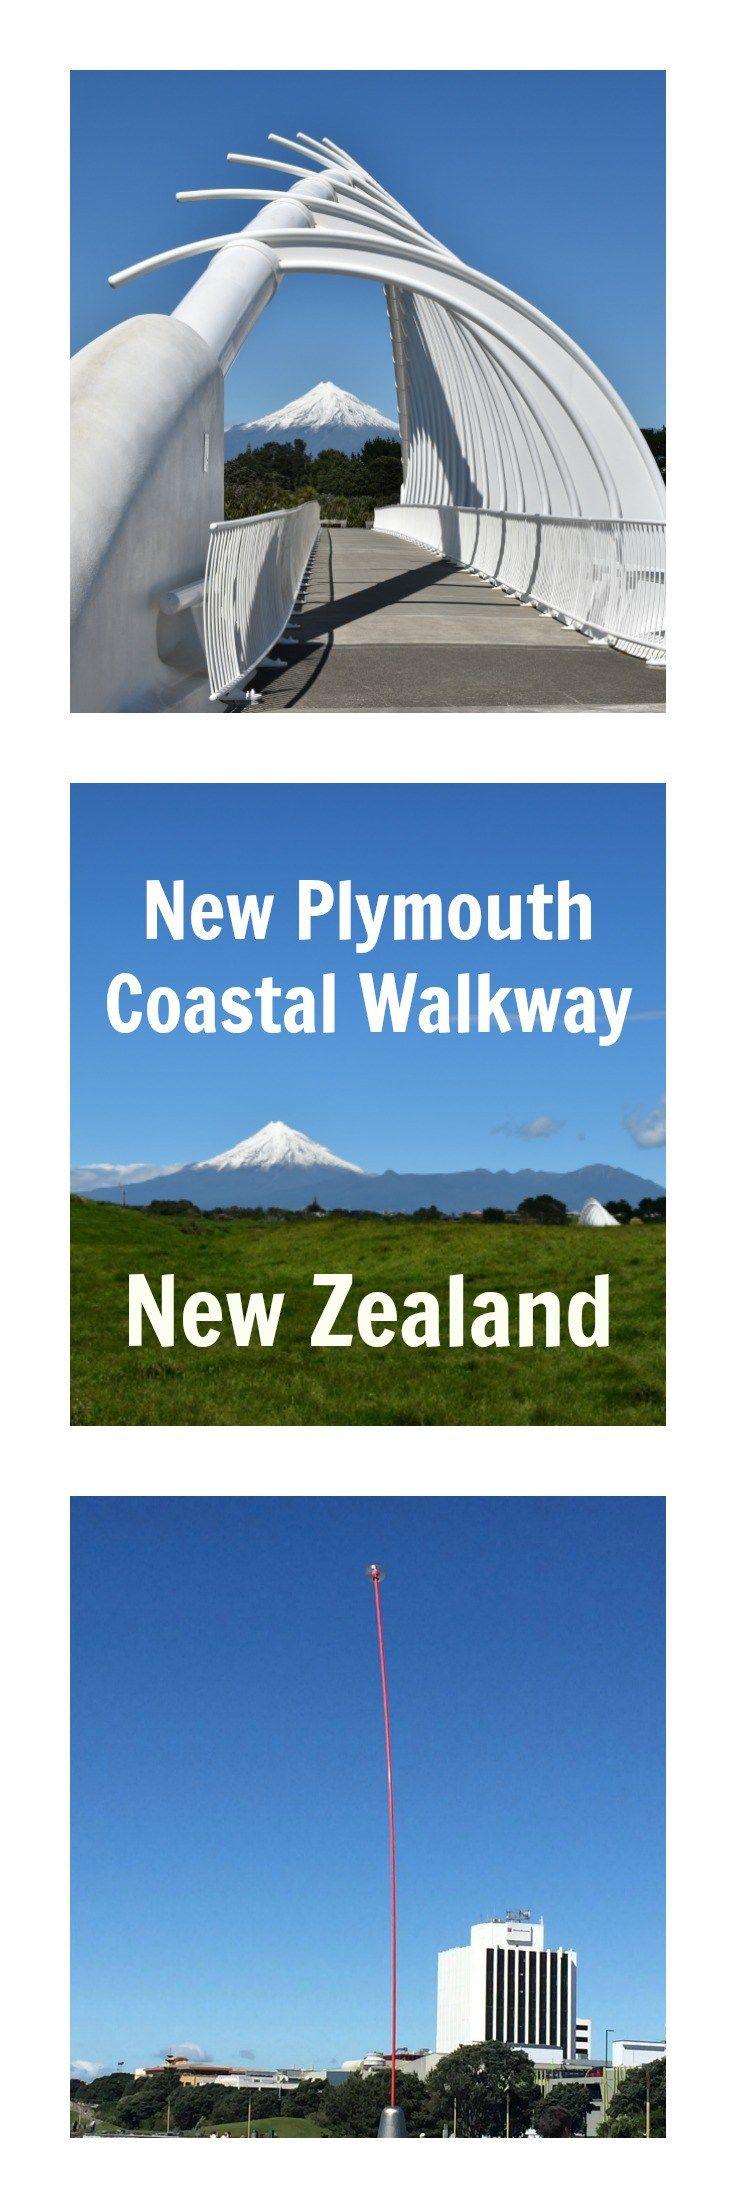 New Plymouth, New Zealand   Coastal Walking or Biking Trail   Mount Taranaki   Top Places to Visit